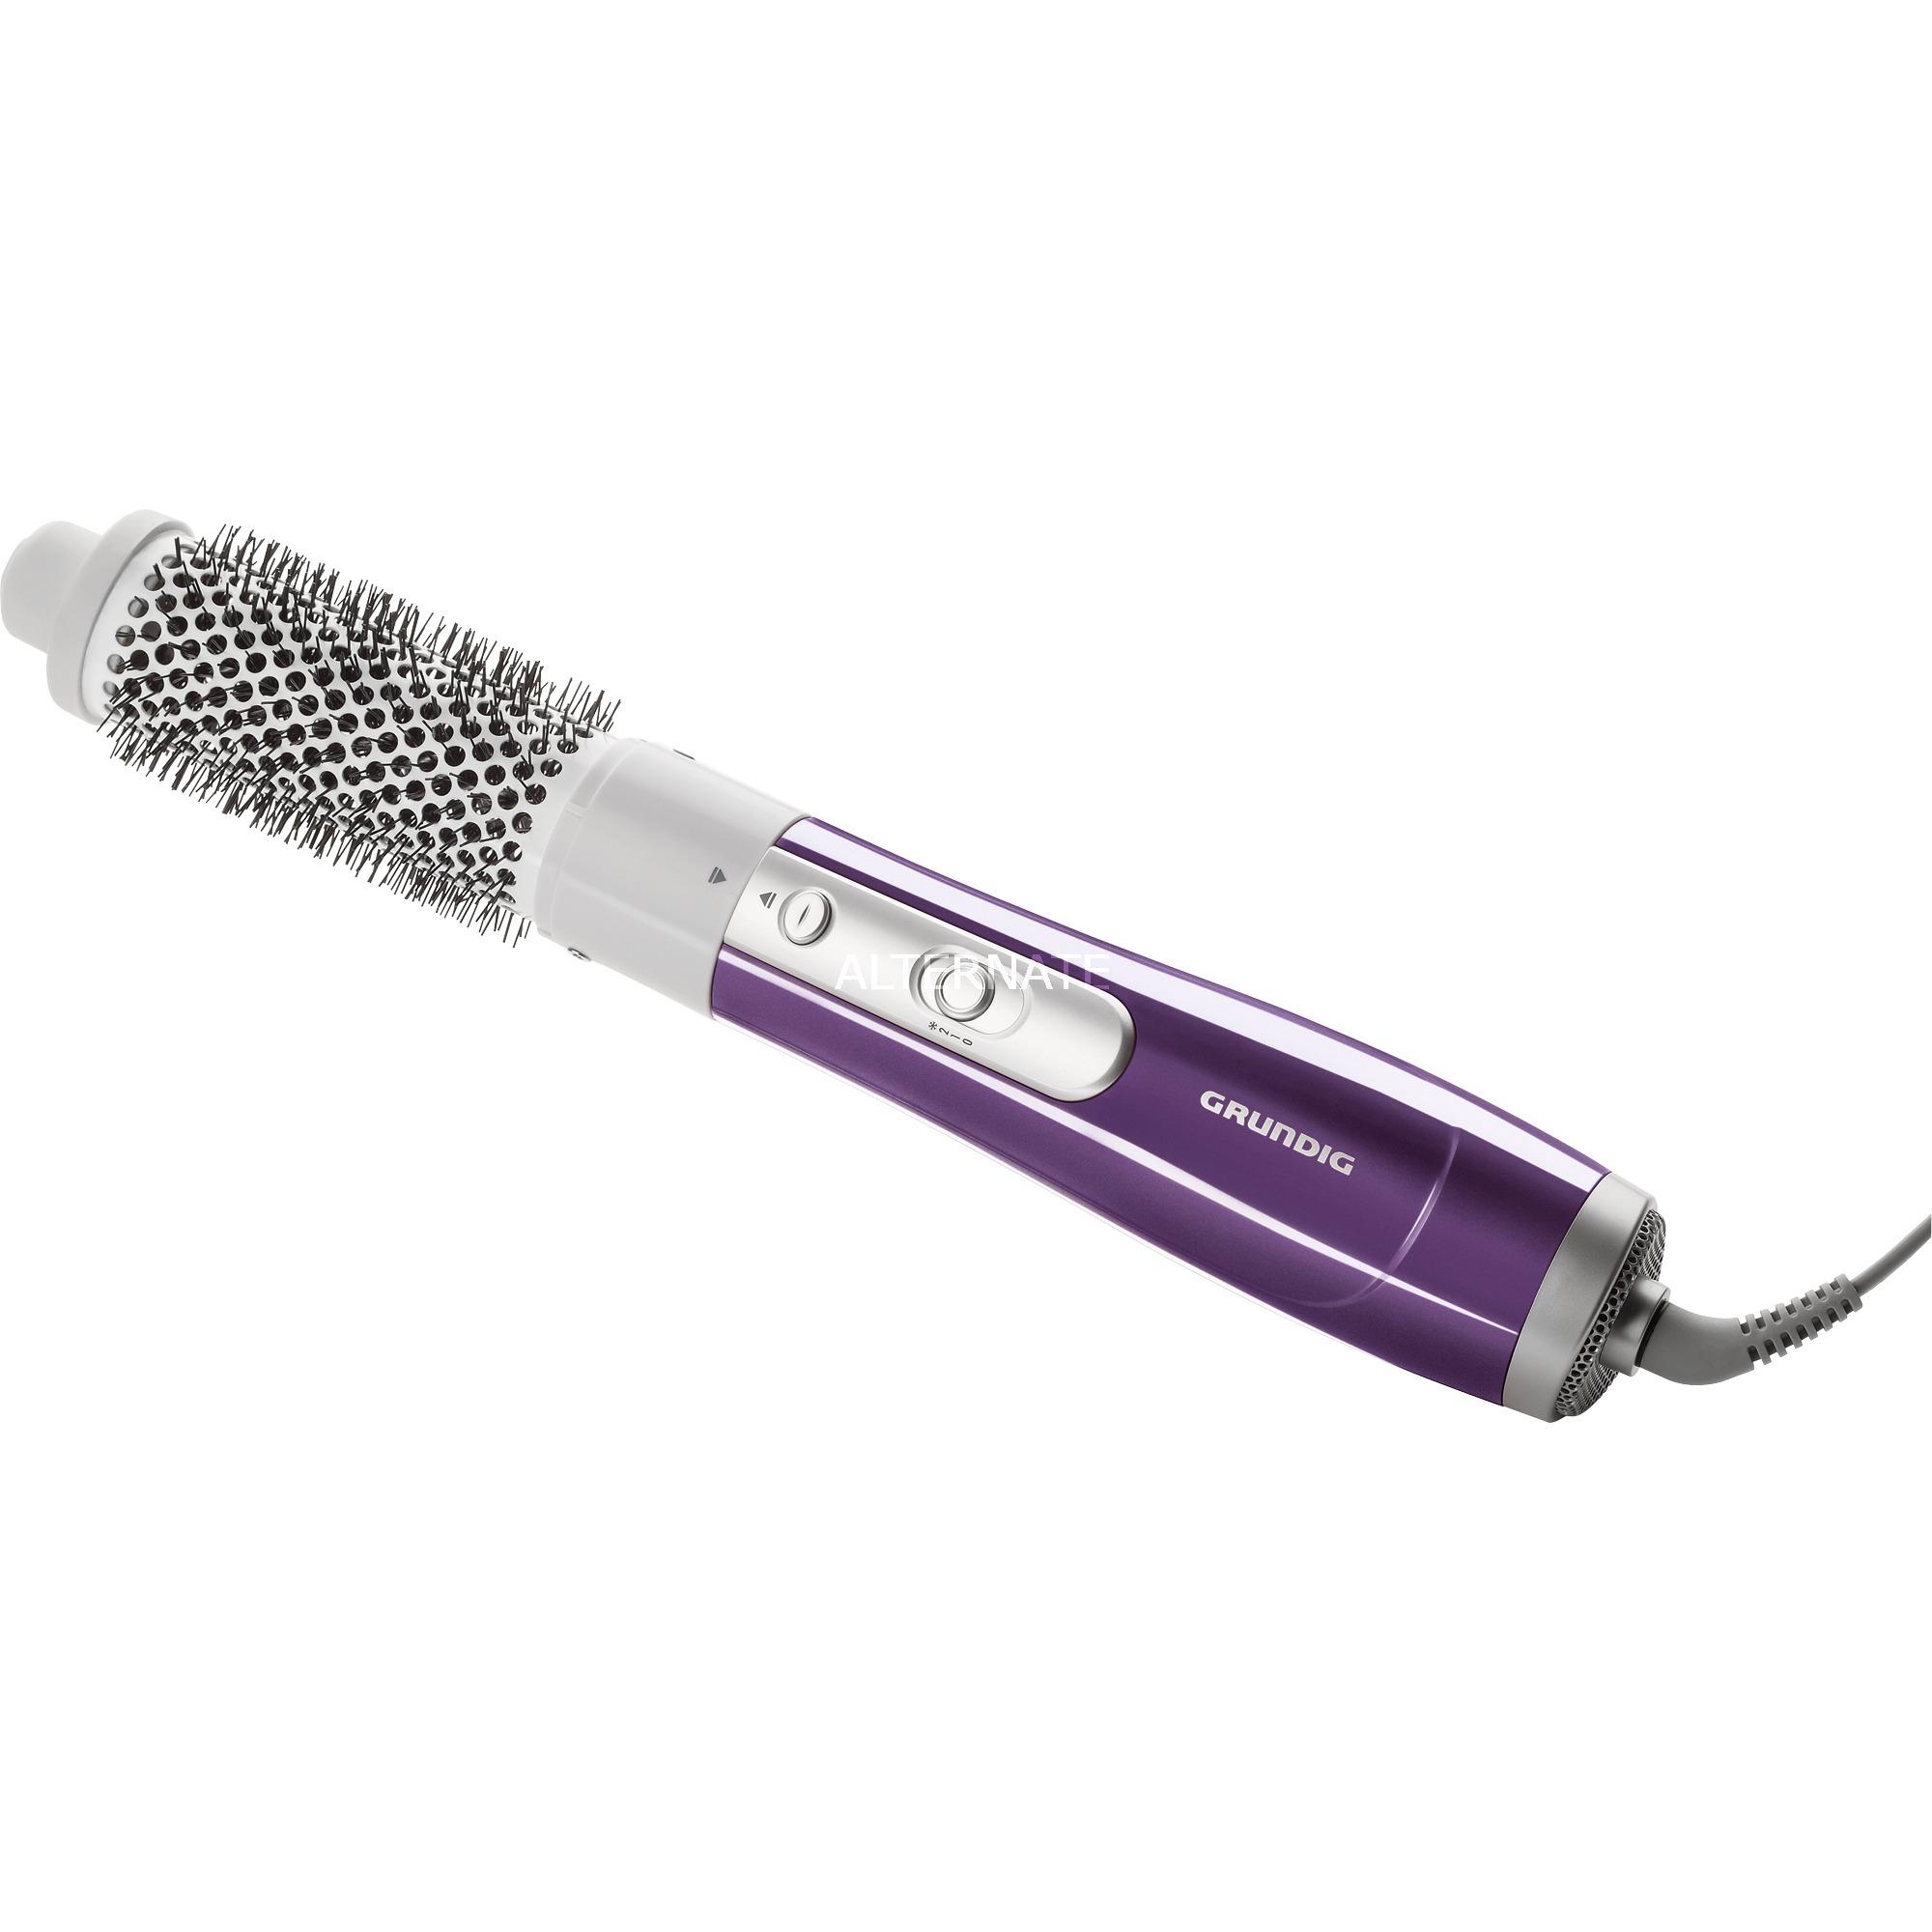 HS 4023 Cepillo de aire caliente Caliente Púrpura, Plata 800 W, Rizador de pelo